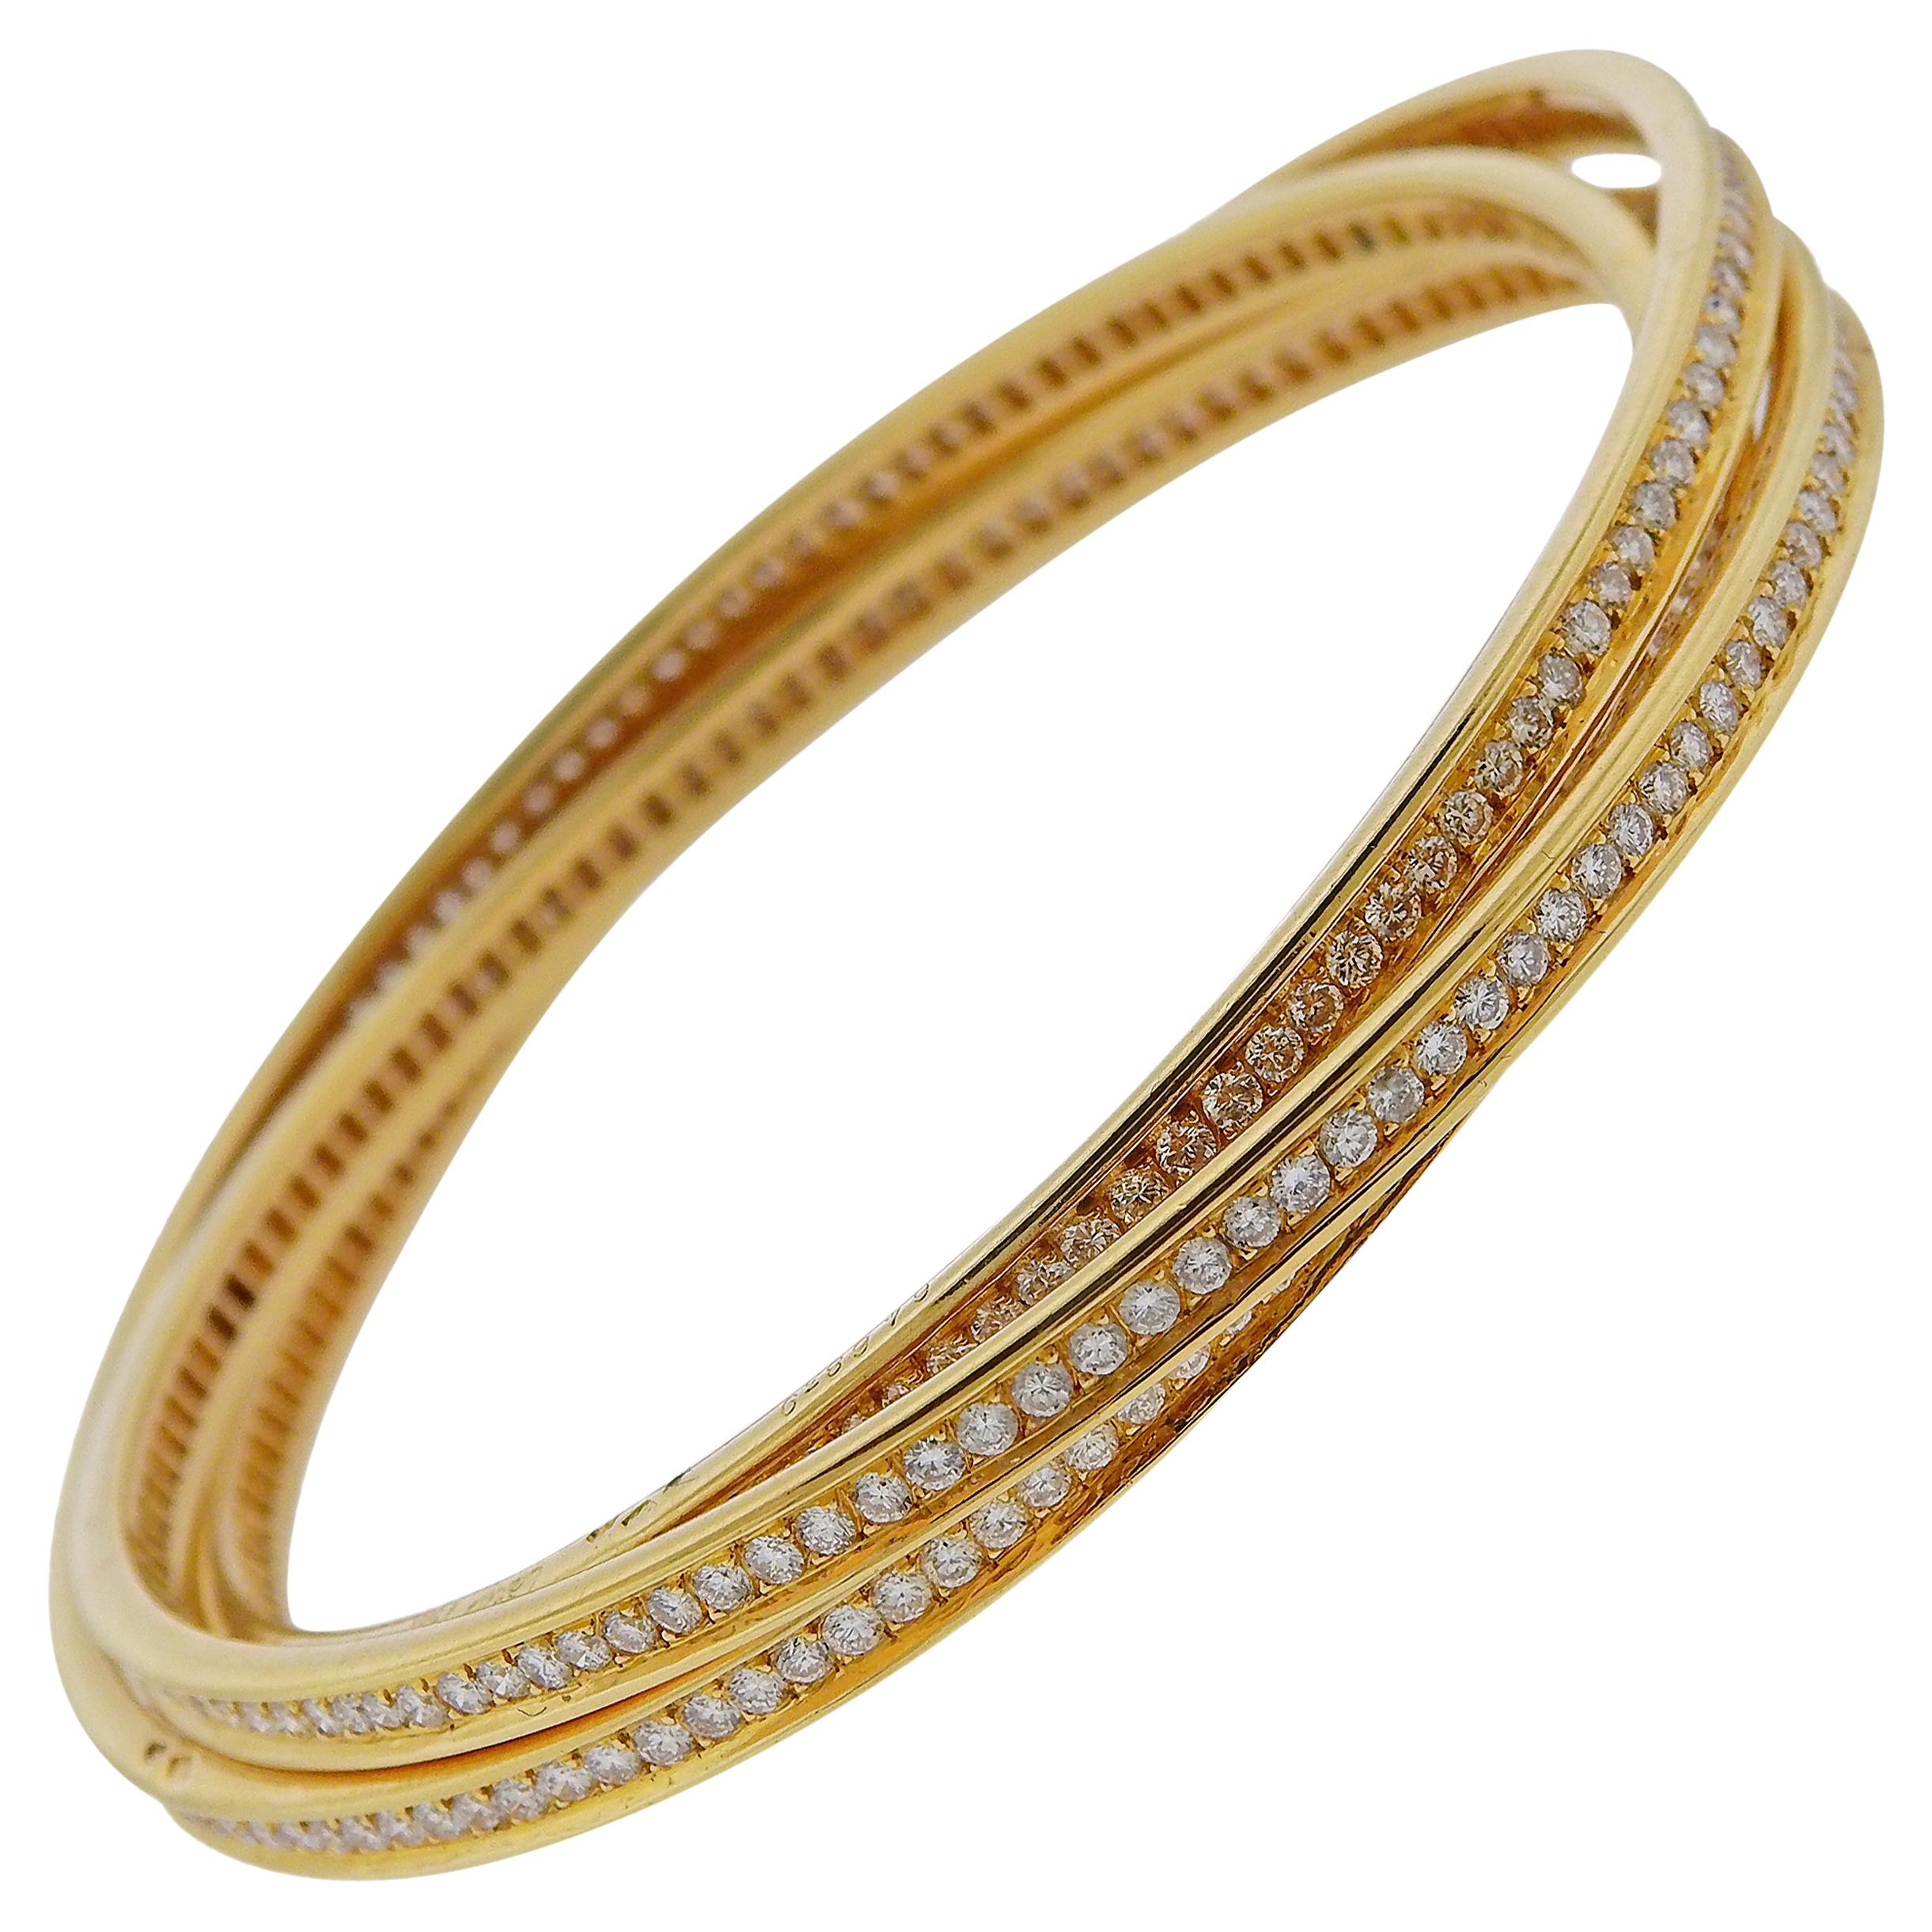 Cartier Trinity Diamond Gold Rolling Bangle Bracelet